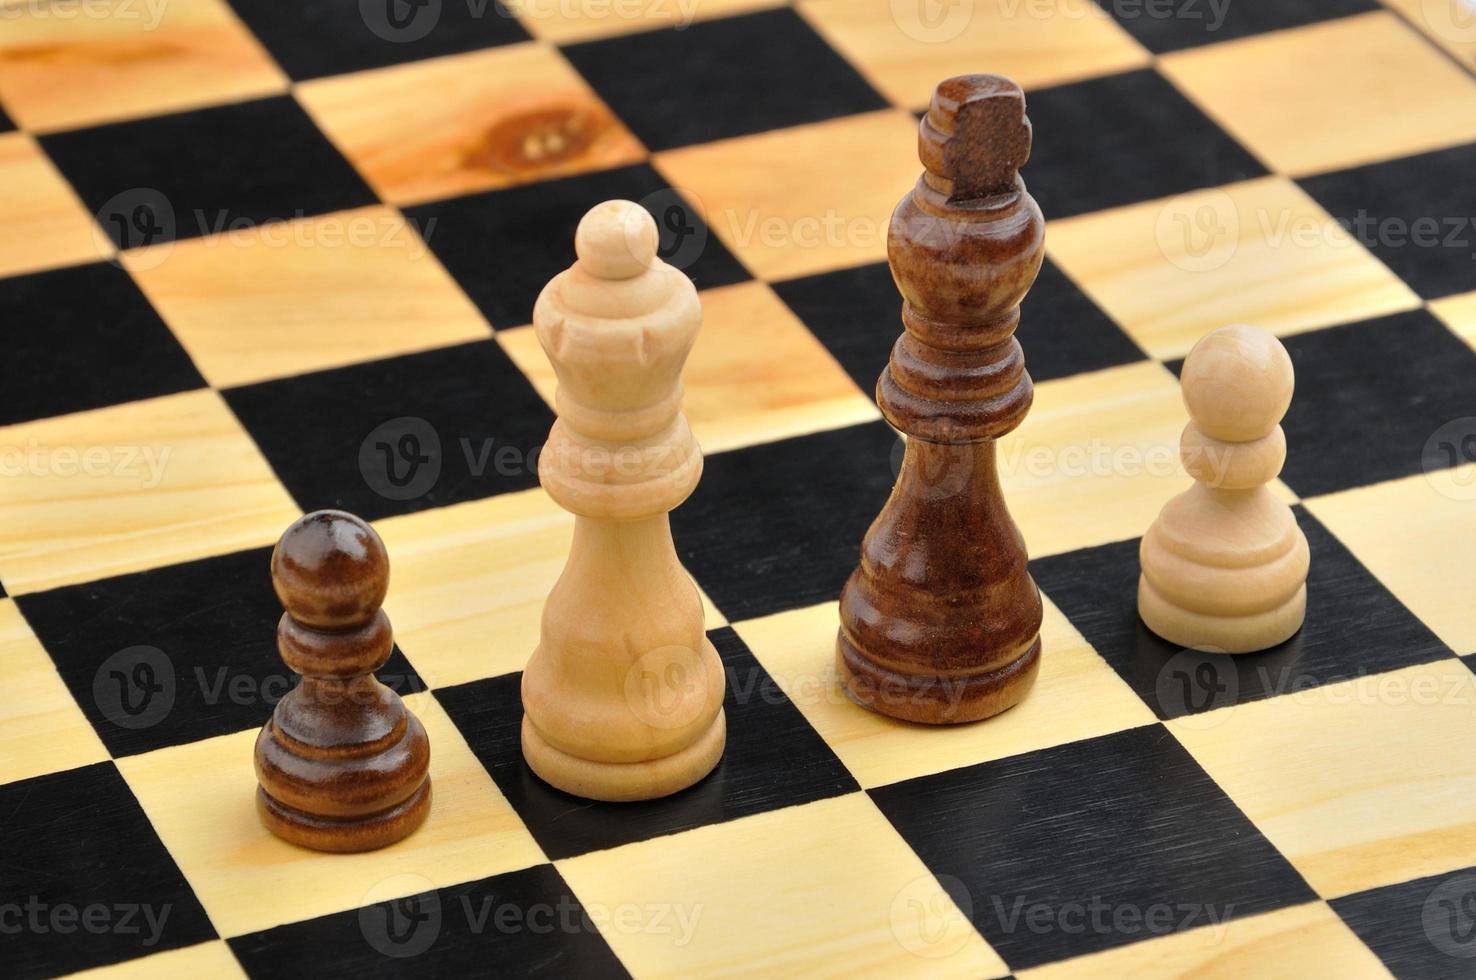 figuras de xadrez como família interracial foto